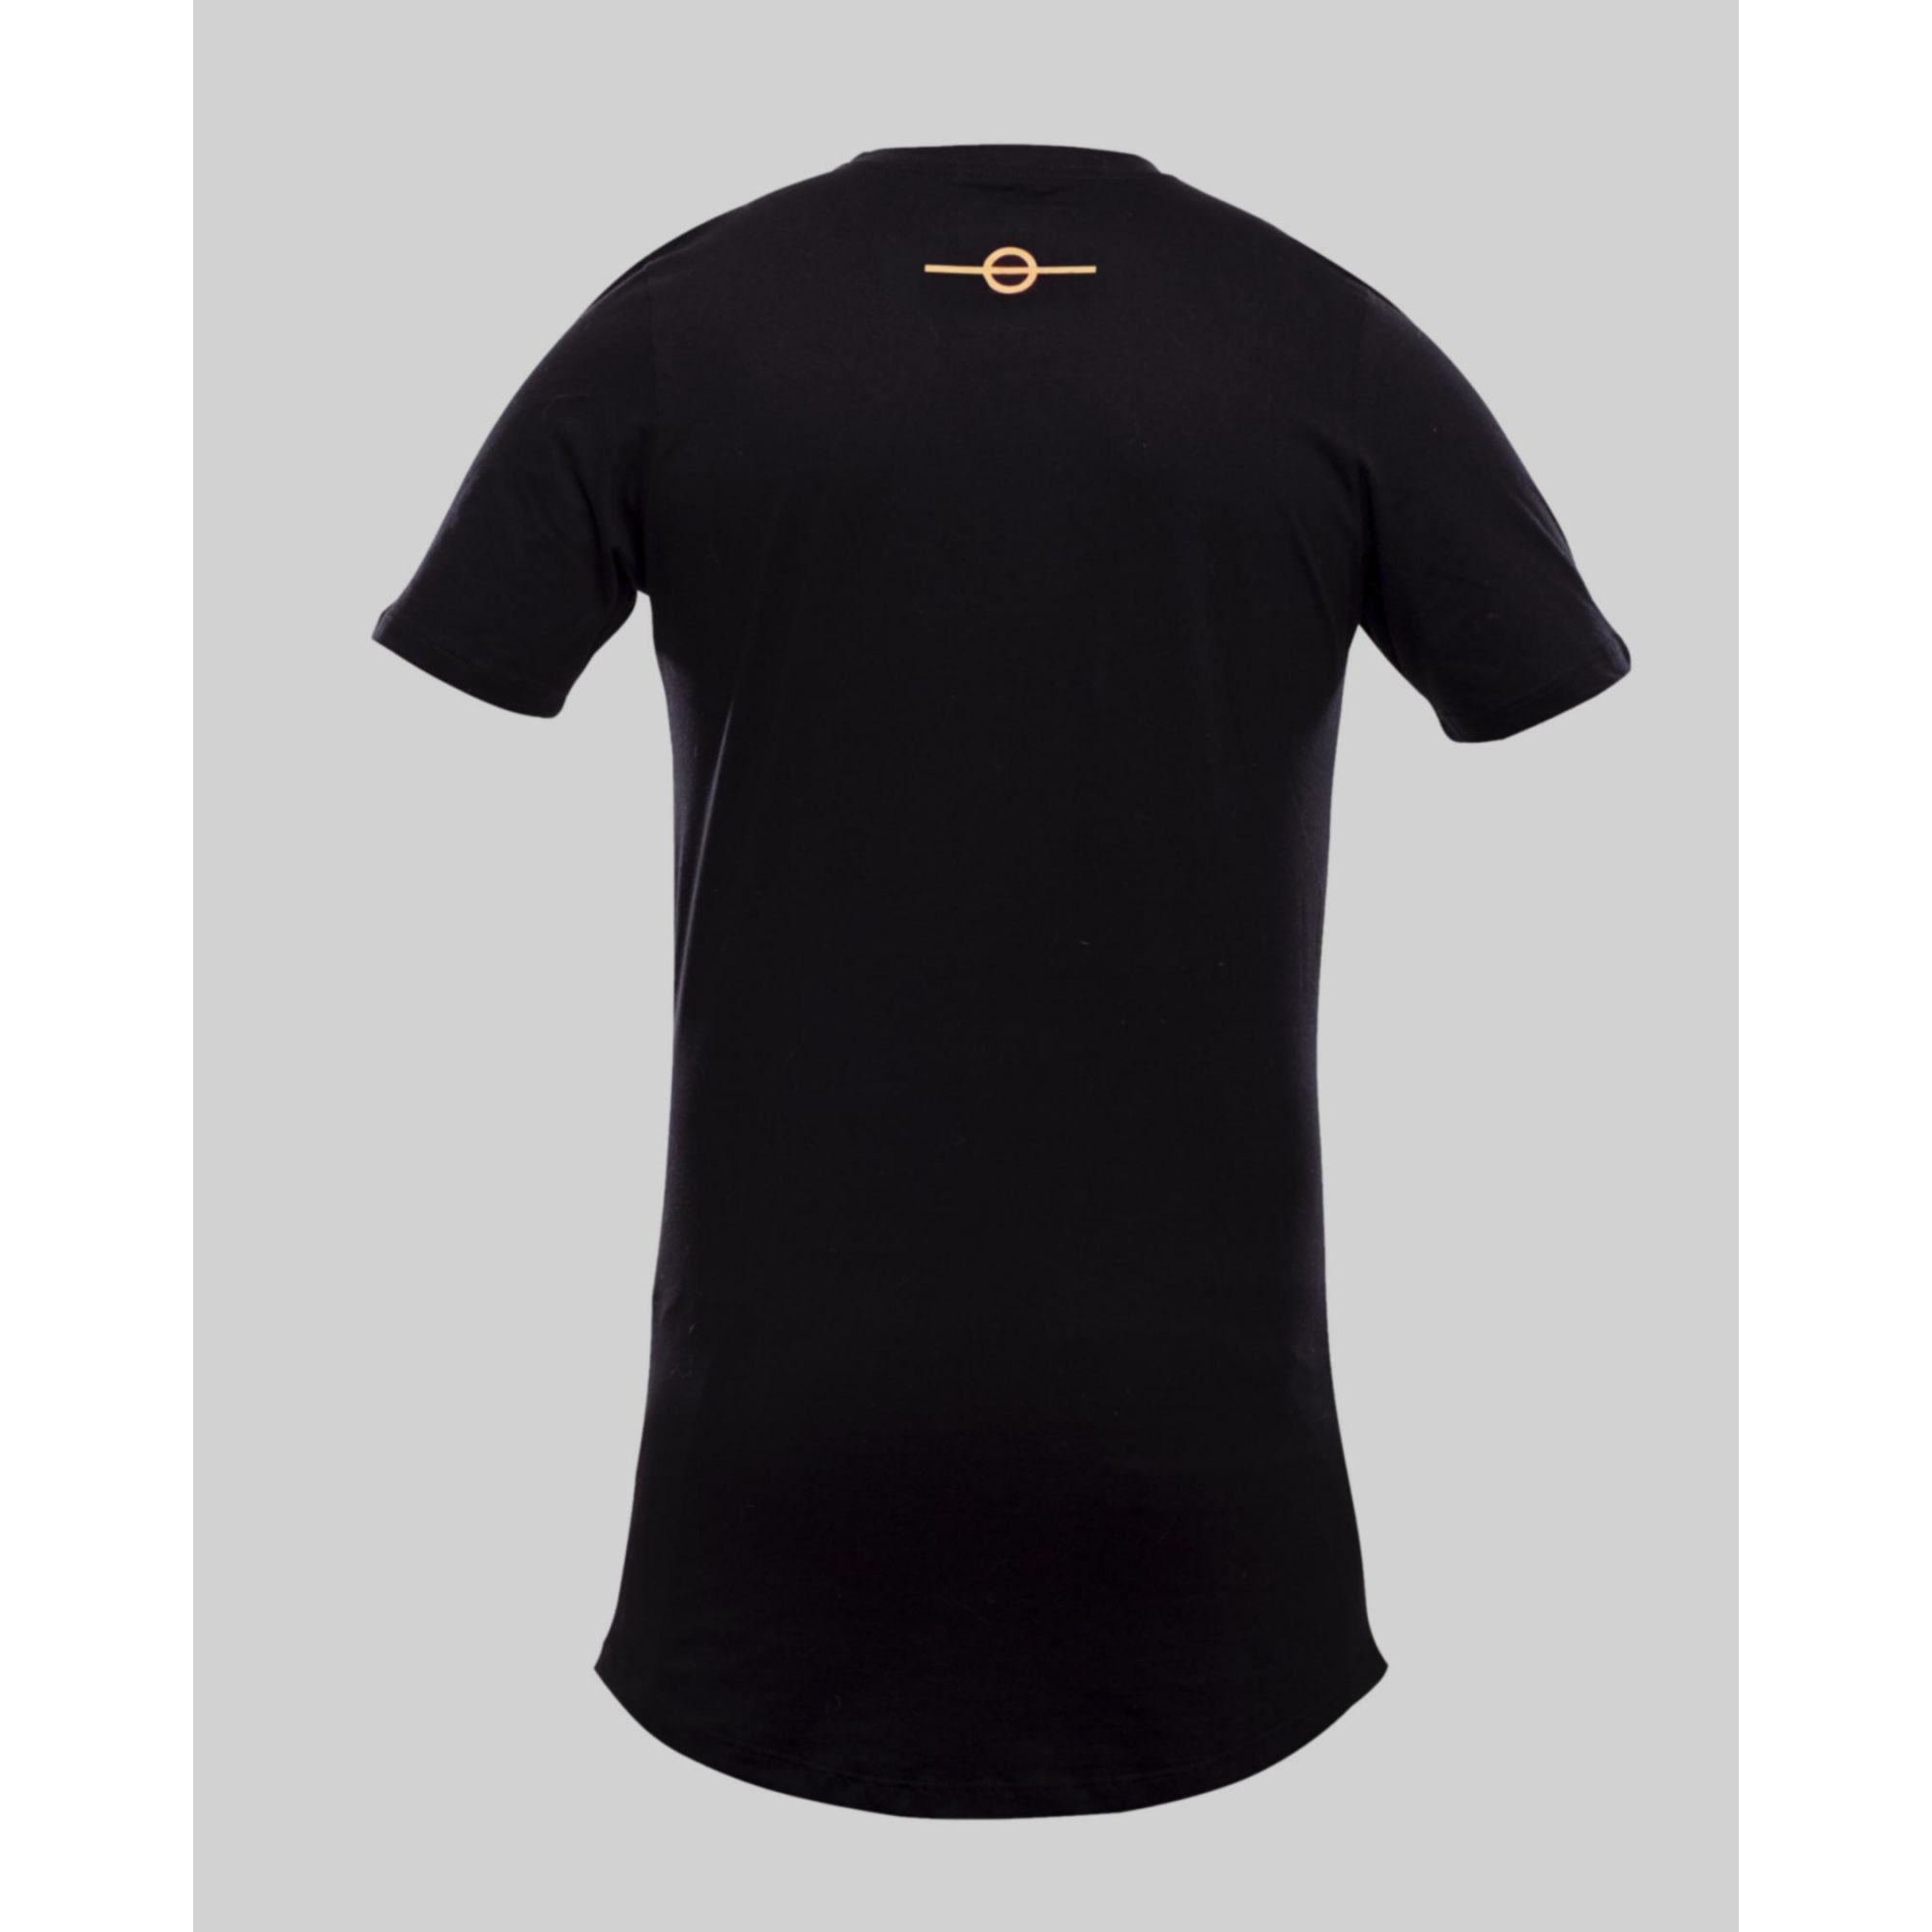 Camiseta Buh FaithFulness Fluor Black